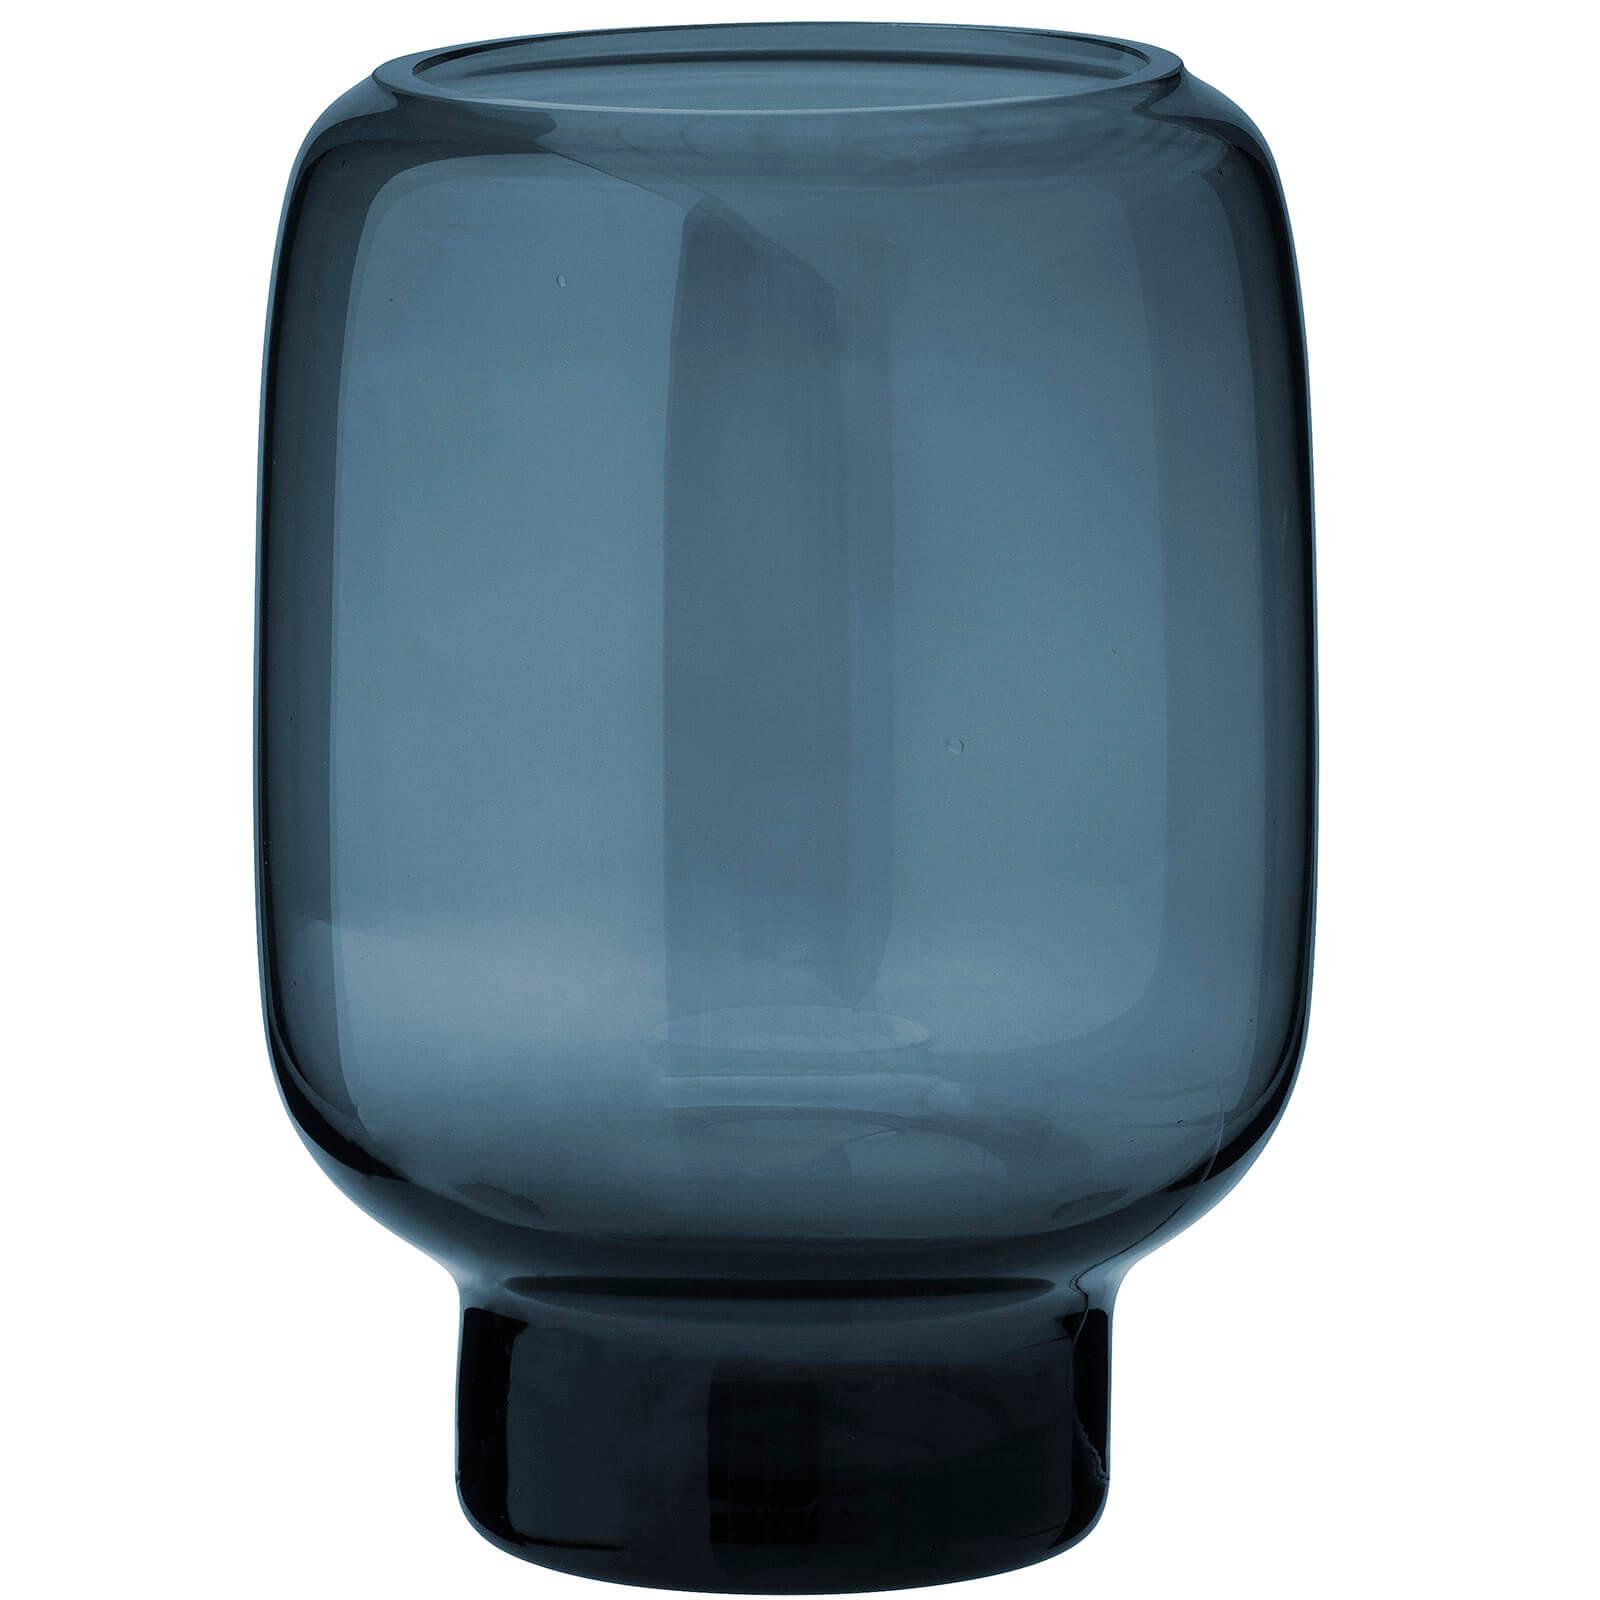 Stelton Small Hoop Vase - 14cm - Midnight Blue